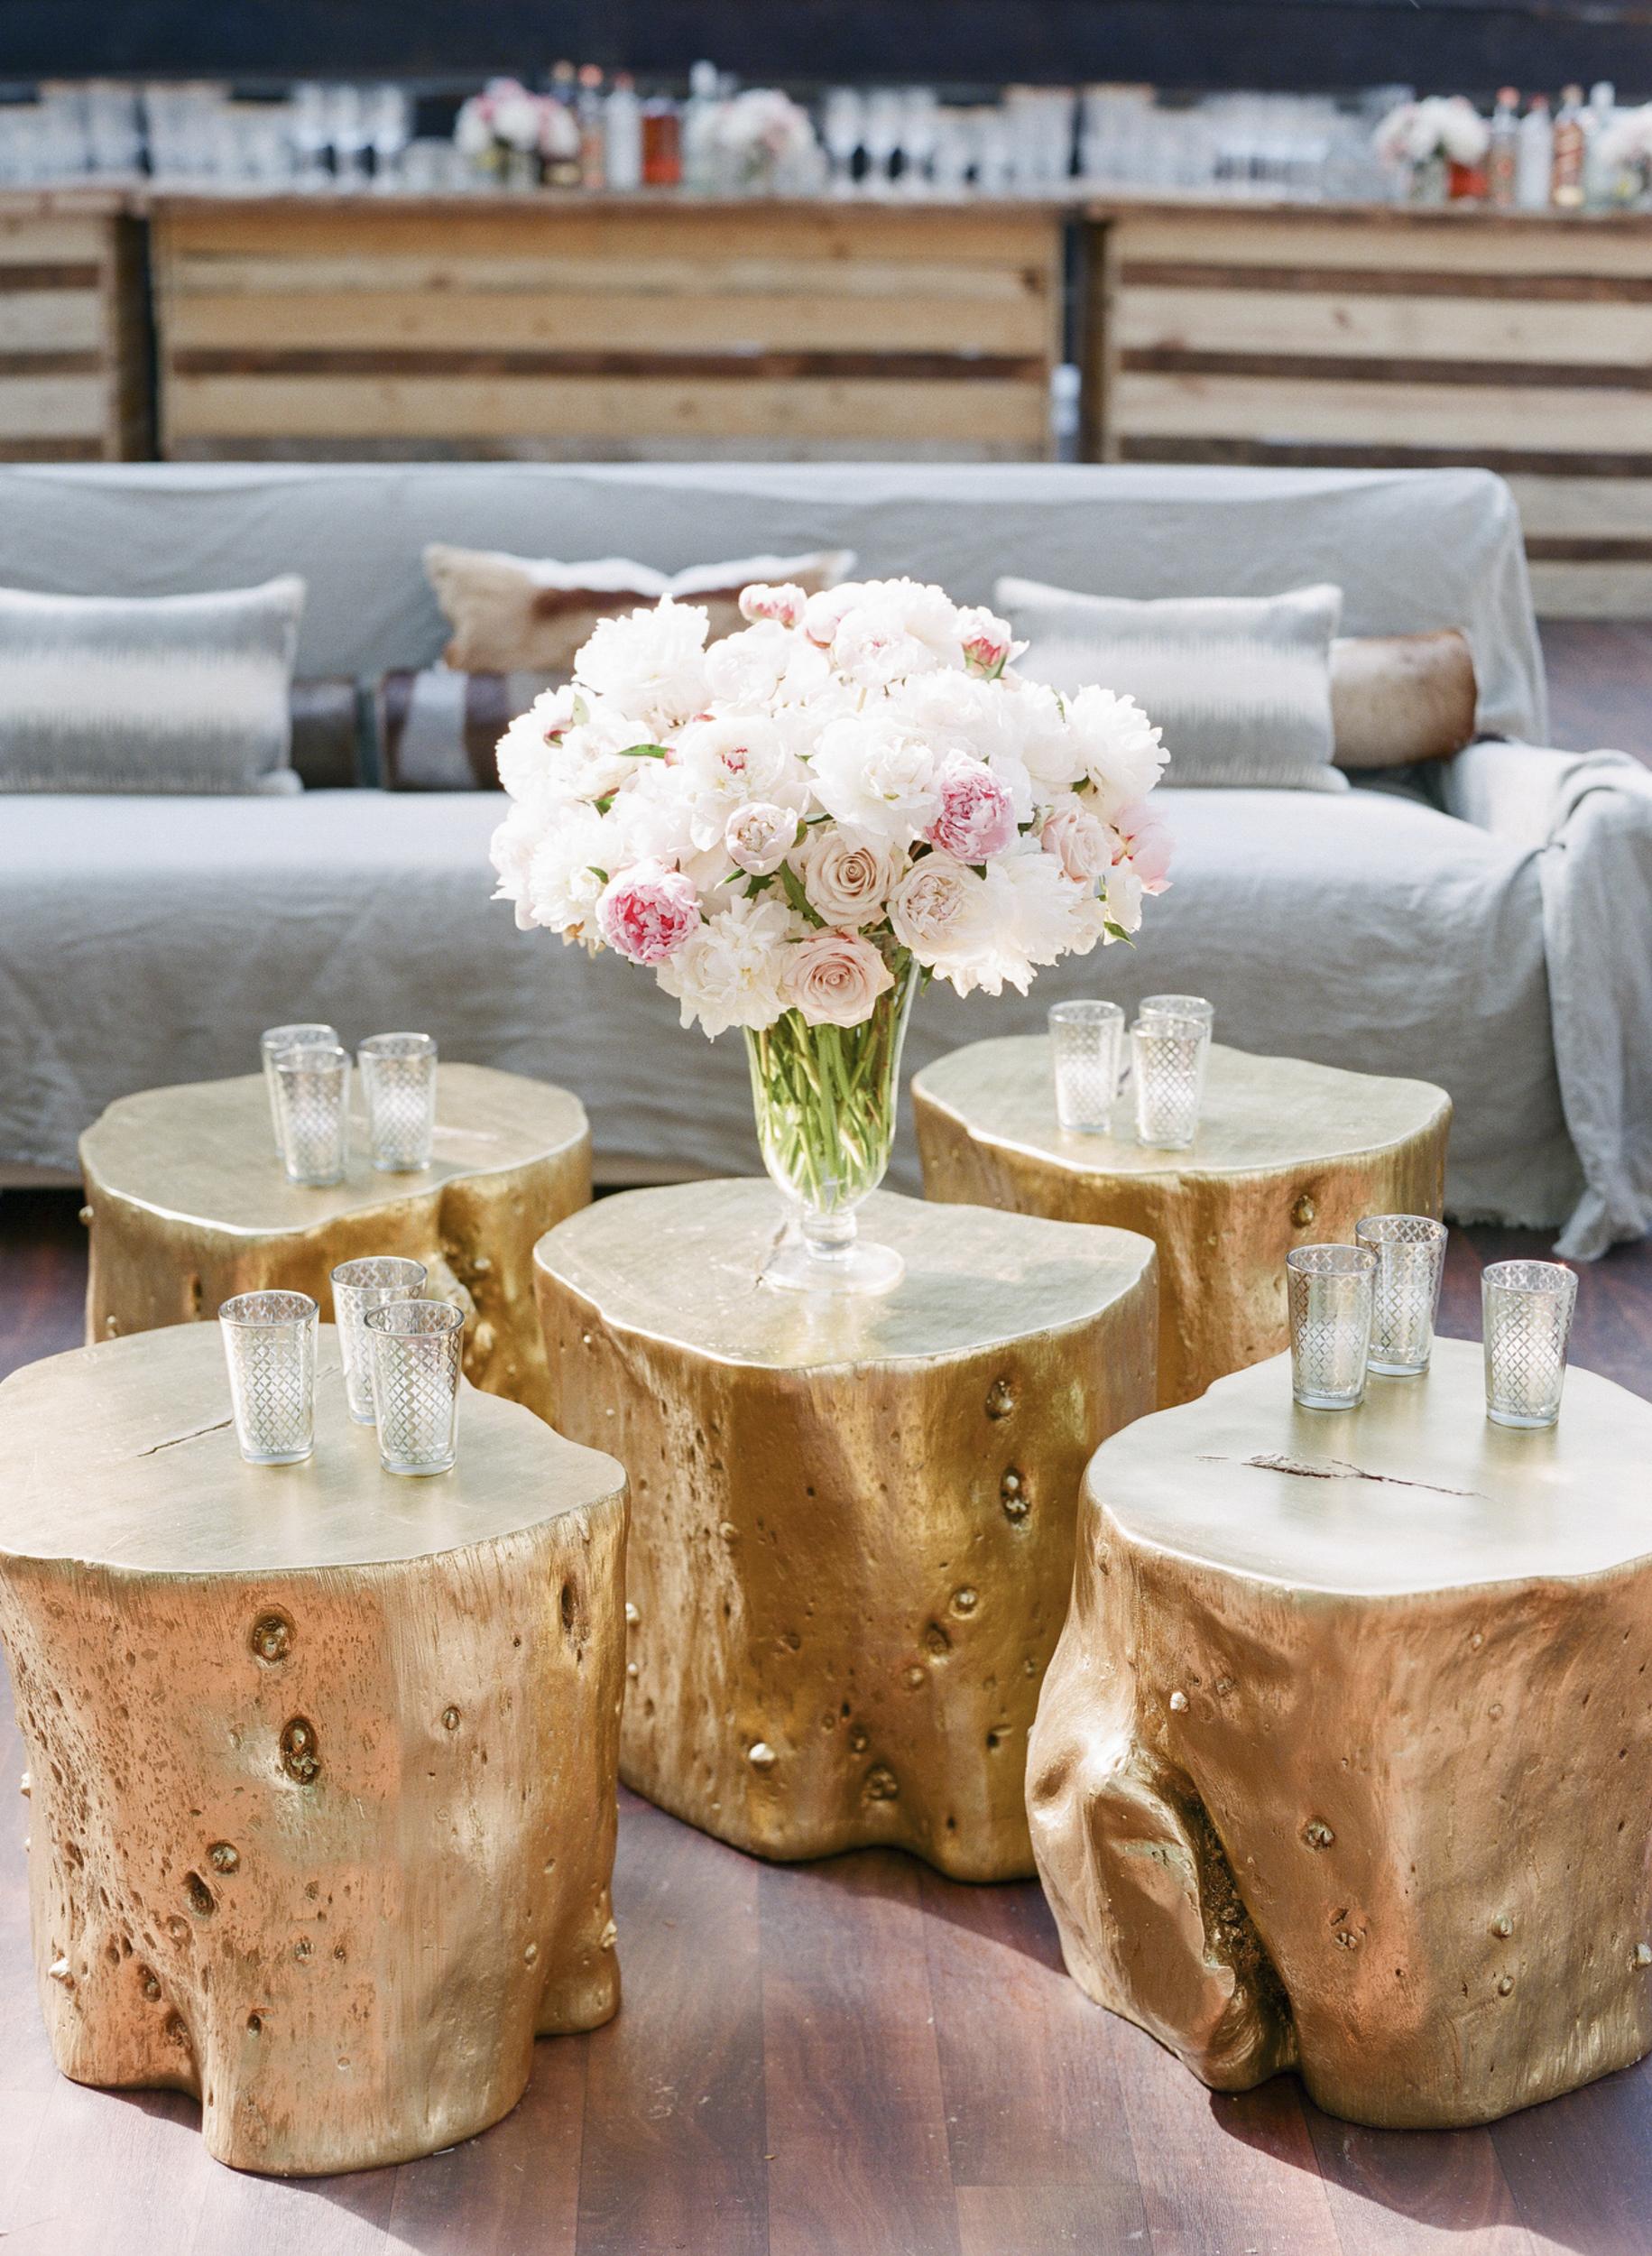 south_carolina_farm_wedding_rustic_chic_surprise_secret_luxe_wedding_bachelorette_emily_maynard_real_weddings-8.jpg